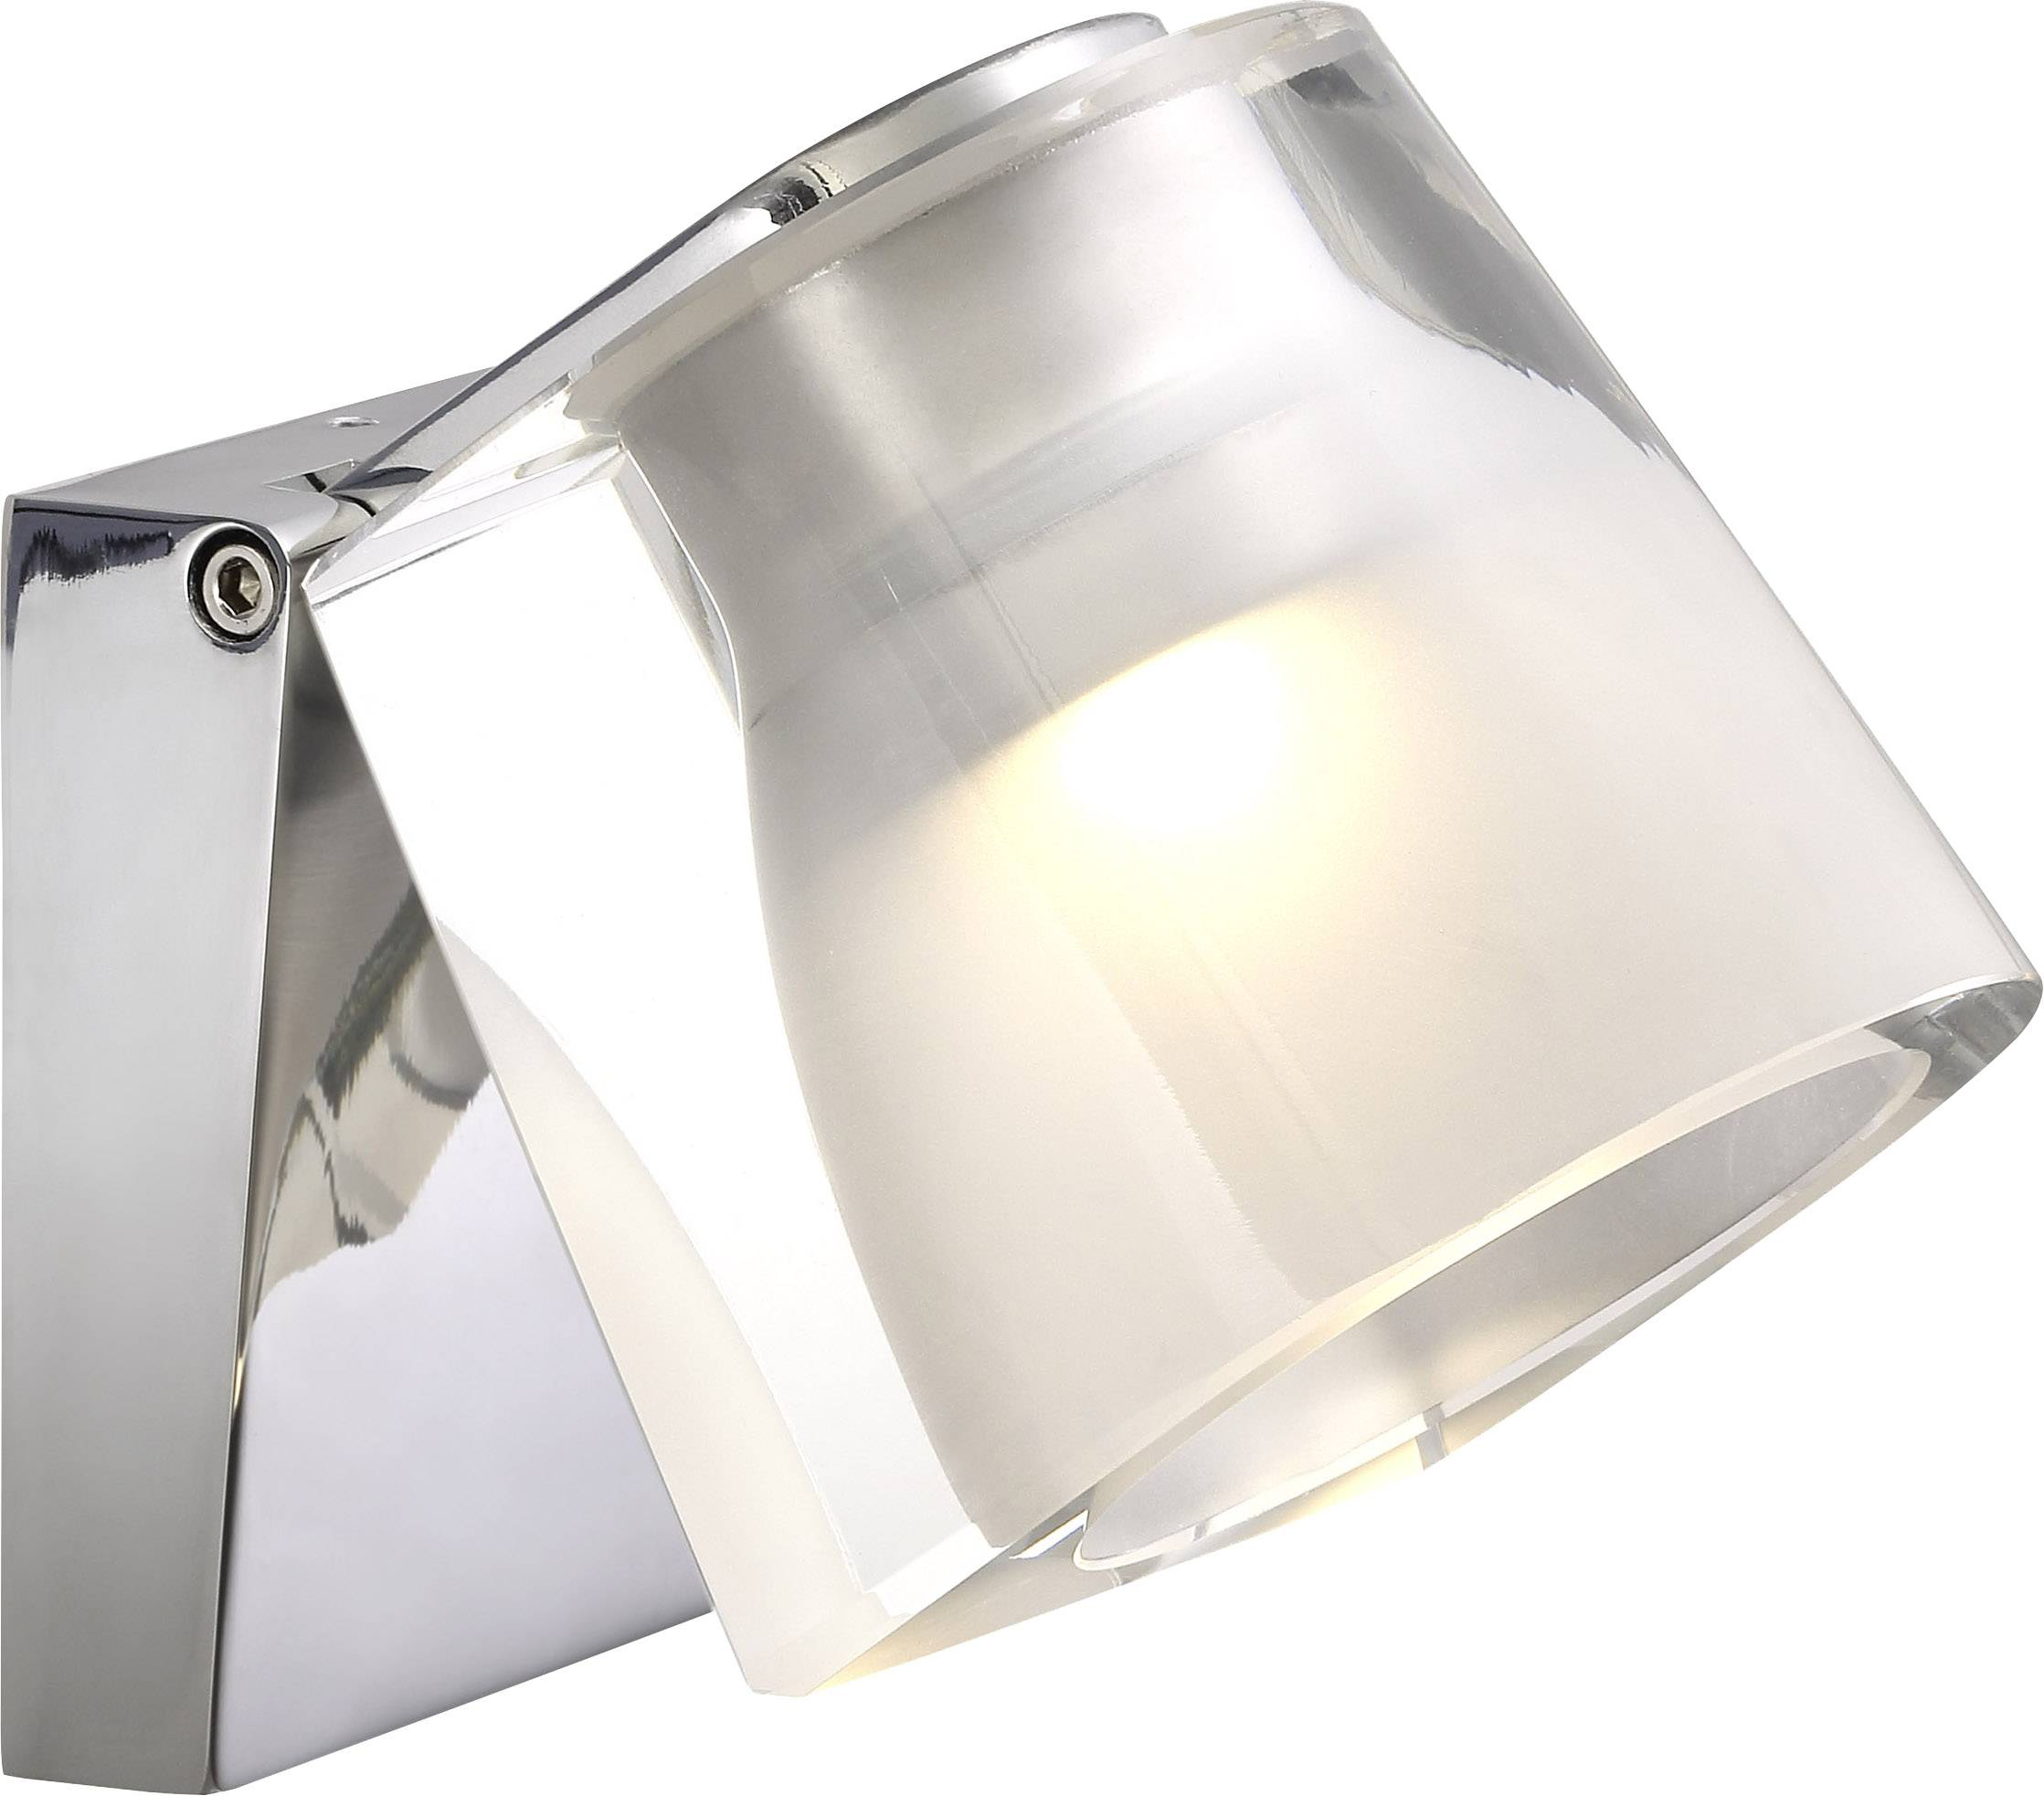 Spiegellamp Voor Badkamer : ▷ spiegellamp badkamer karwei kopen online internetwinkel